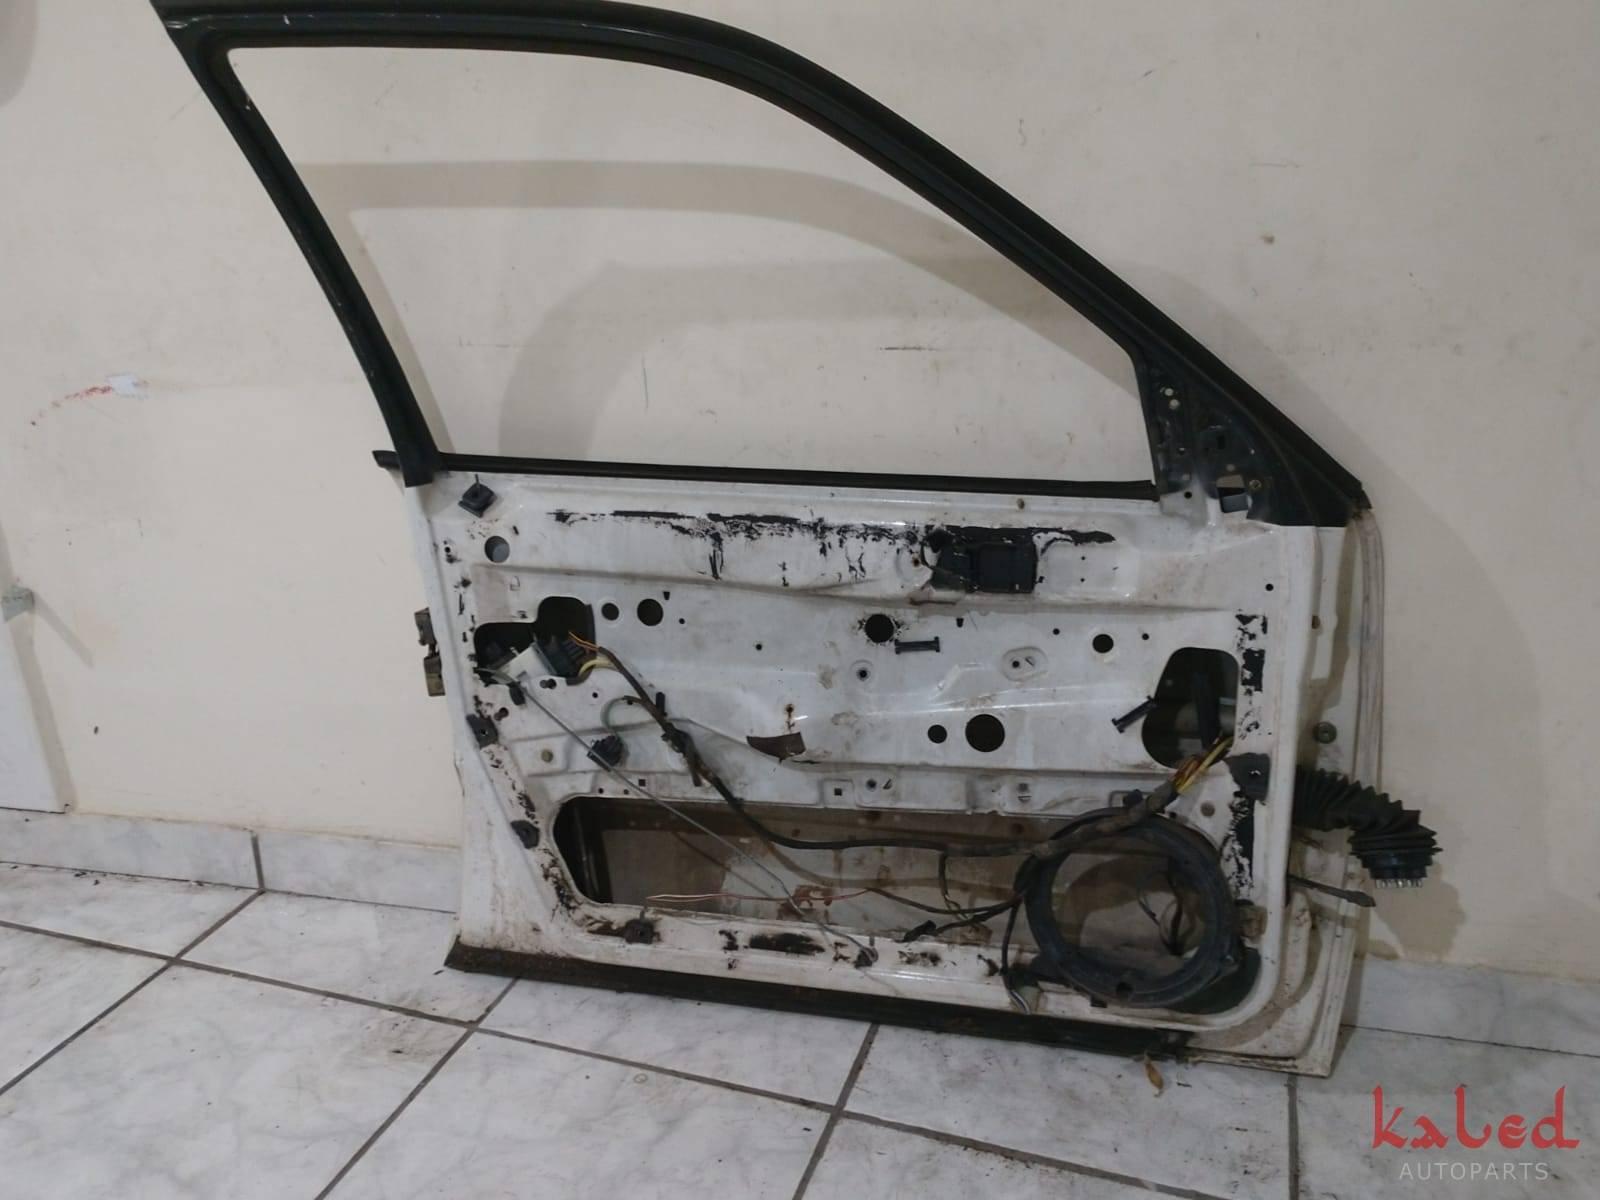 Porta dianteira esquerda VW Passat 93 a 96 - Kaled Auto Parts